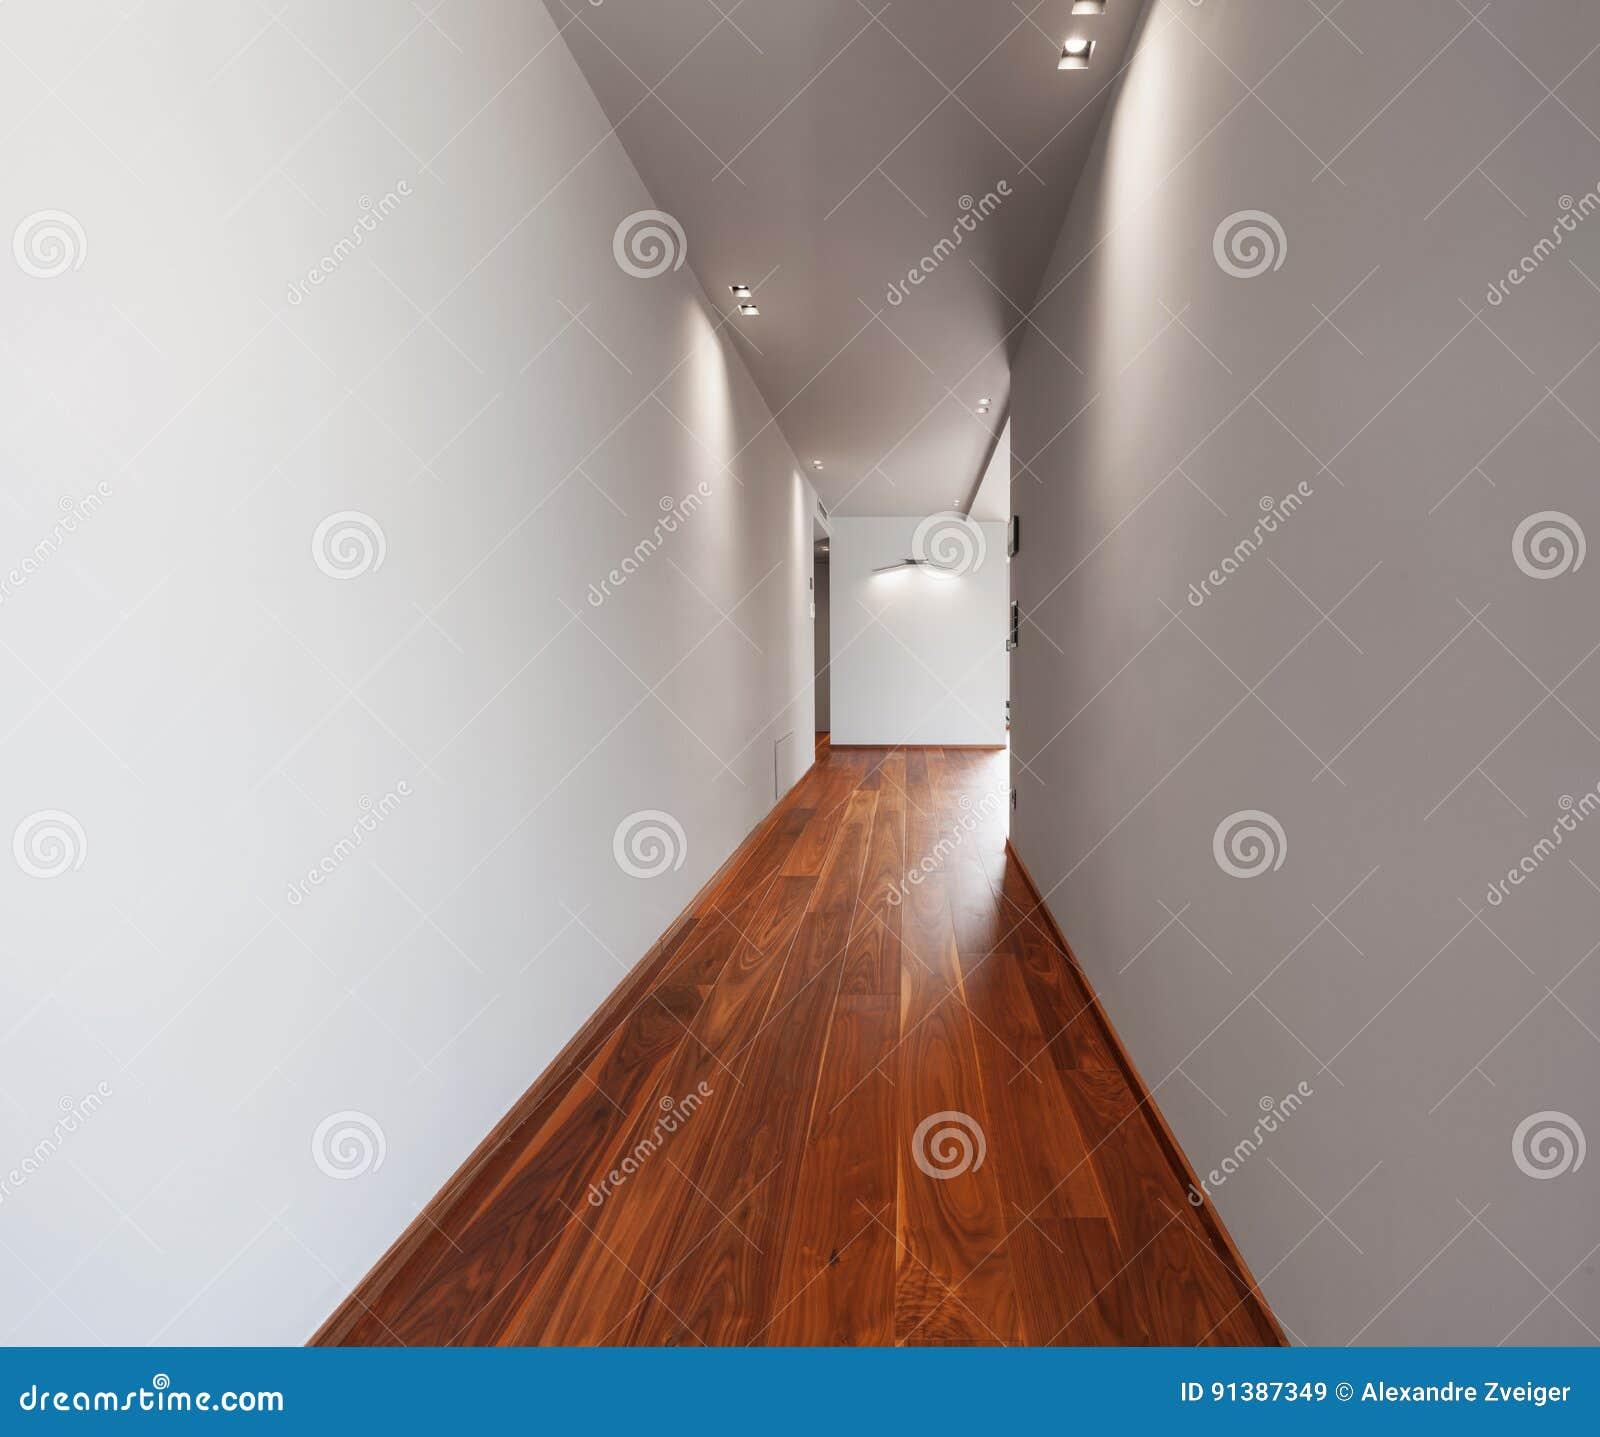 Corridor in a modern house, empty white walls